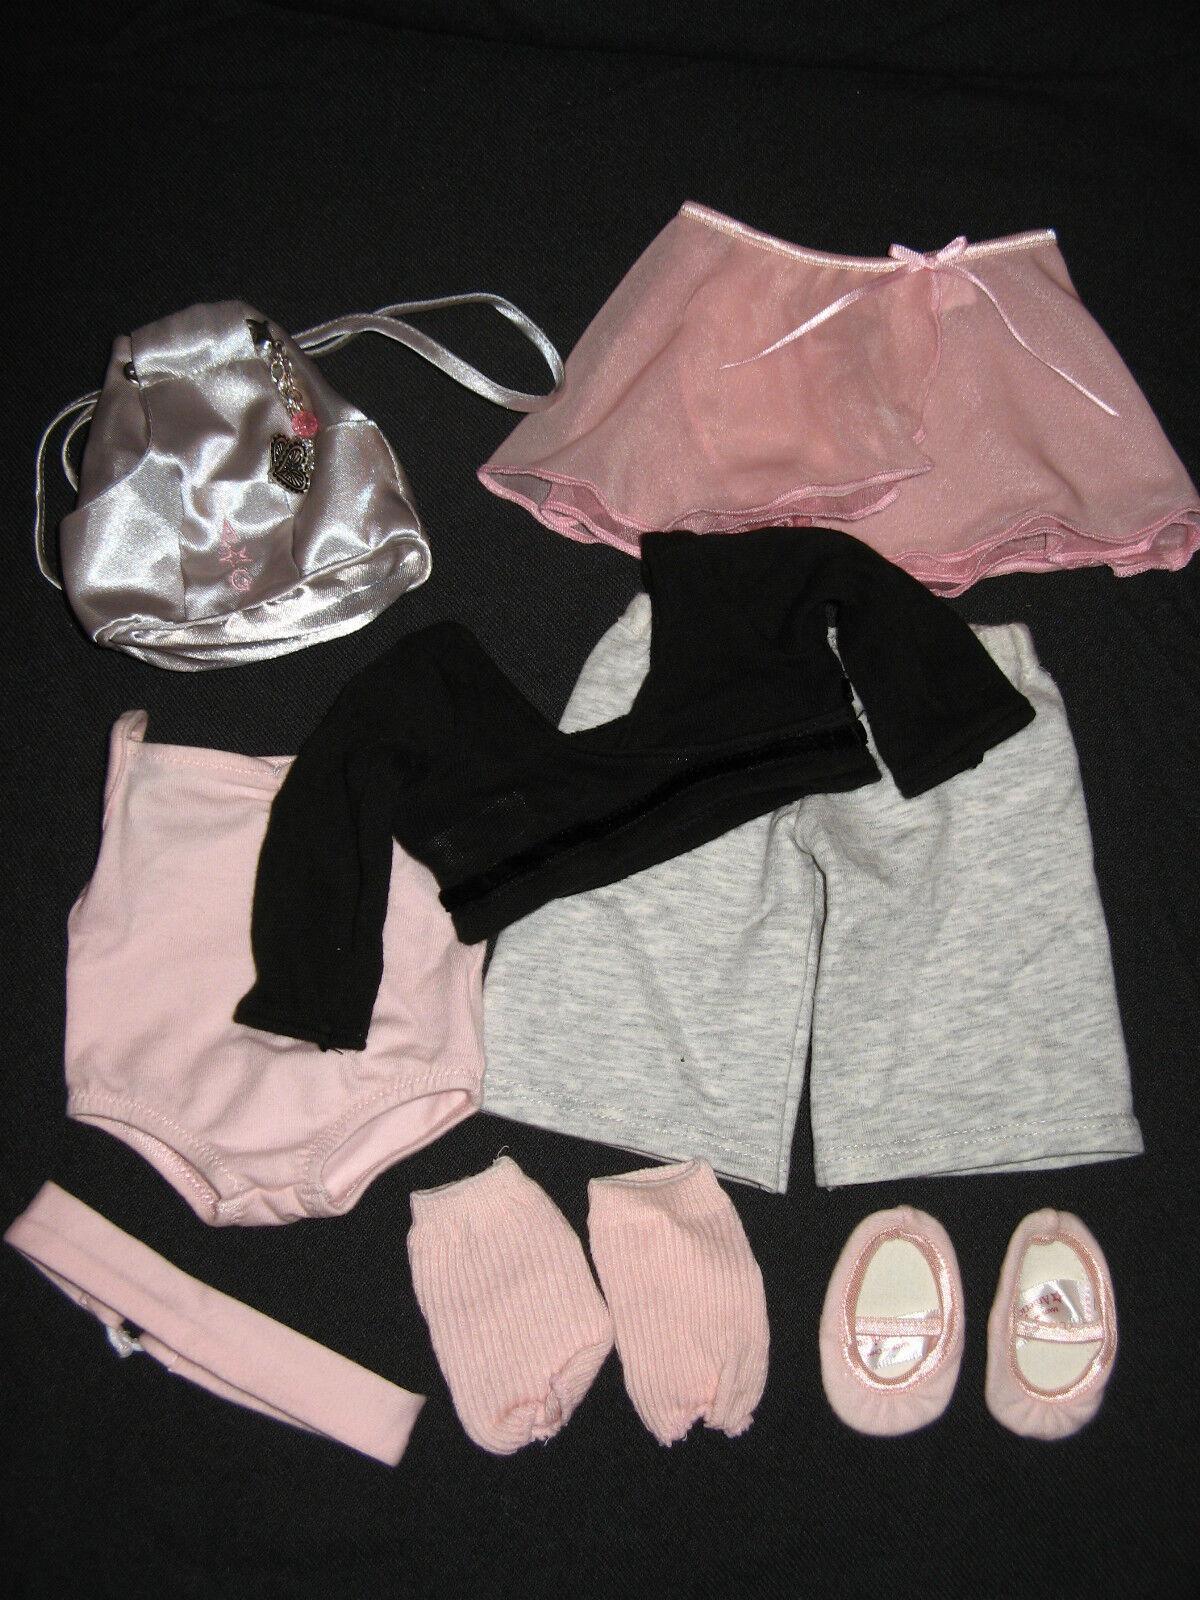 Genuine American Girl bambola vestiti - 2-in - 1 Vestito da ballerina